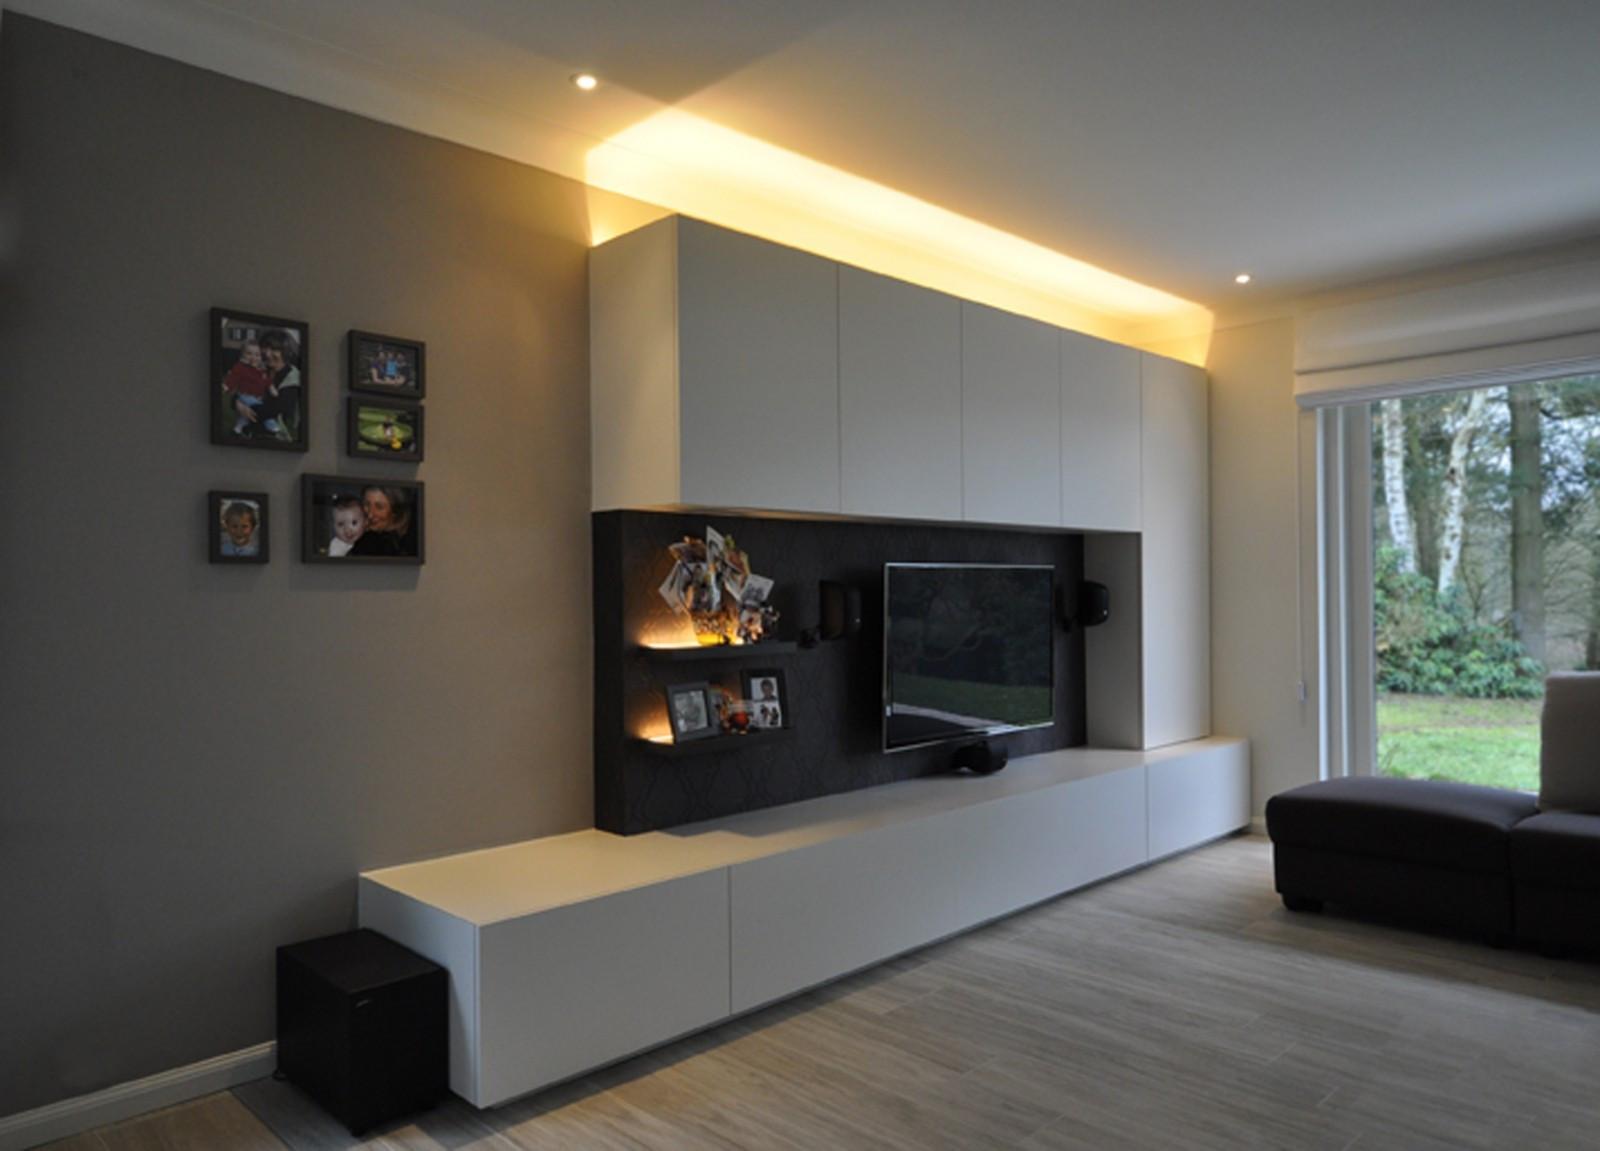 Tv Kast Slaapkamer : Tv meubel op slaapkamer in living kast id kasten